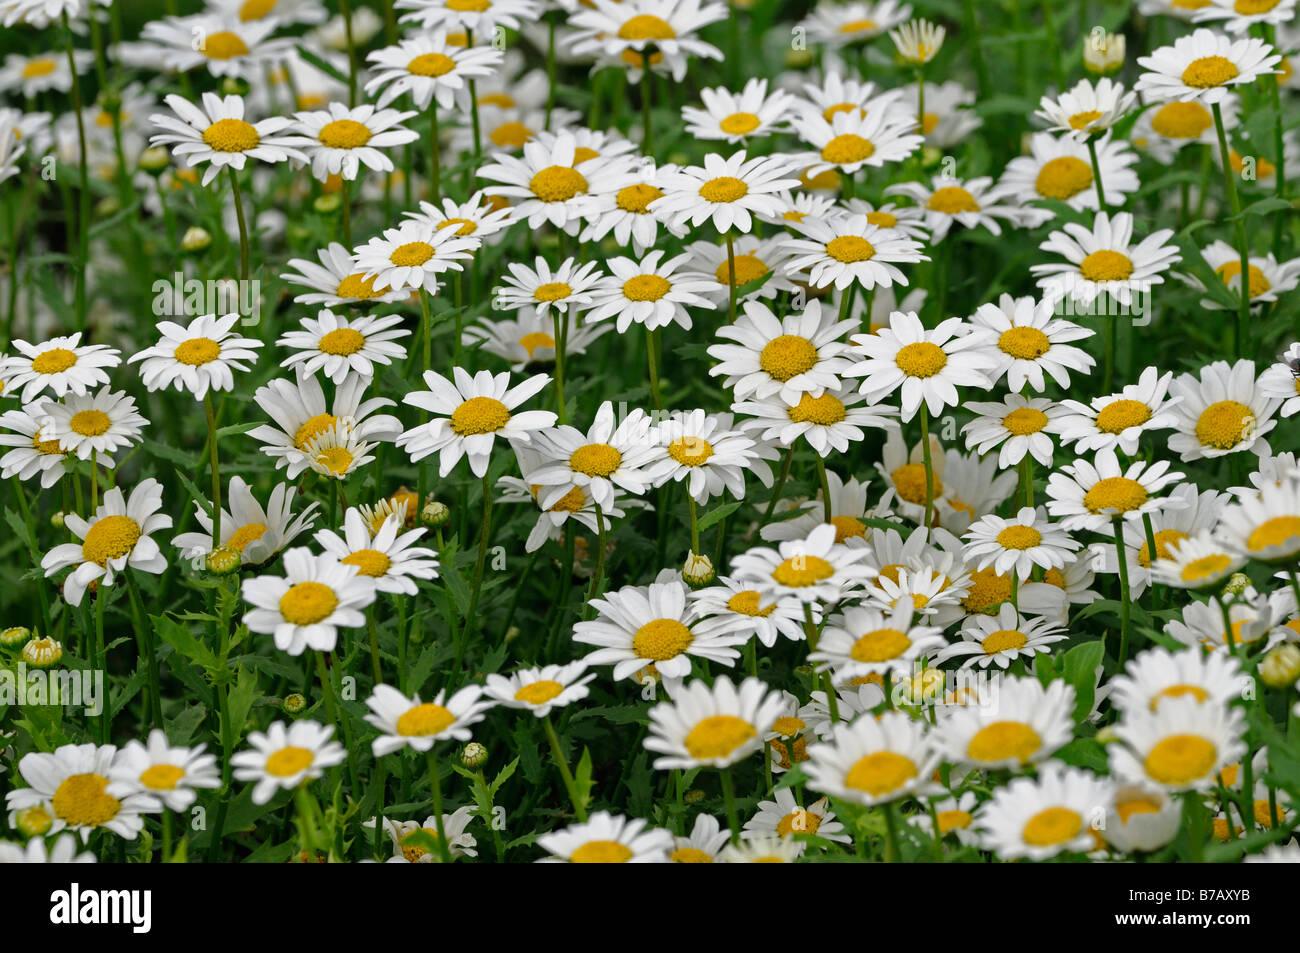 Chrysanthemum paludosum snowland daisy dwarf daisy type hardy chrysanthemum paludosum snowland leucanthemum mini marguerite dwarf daisy type annual flower bloom blossom white dhlflorist Images